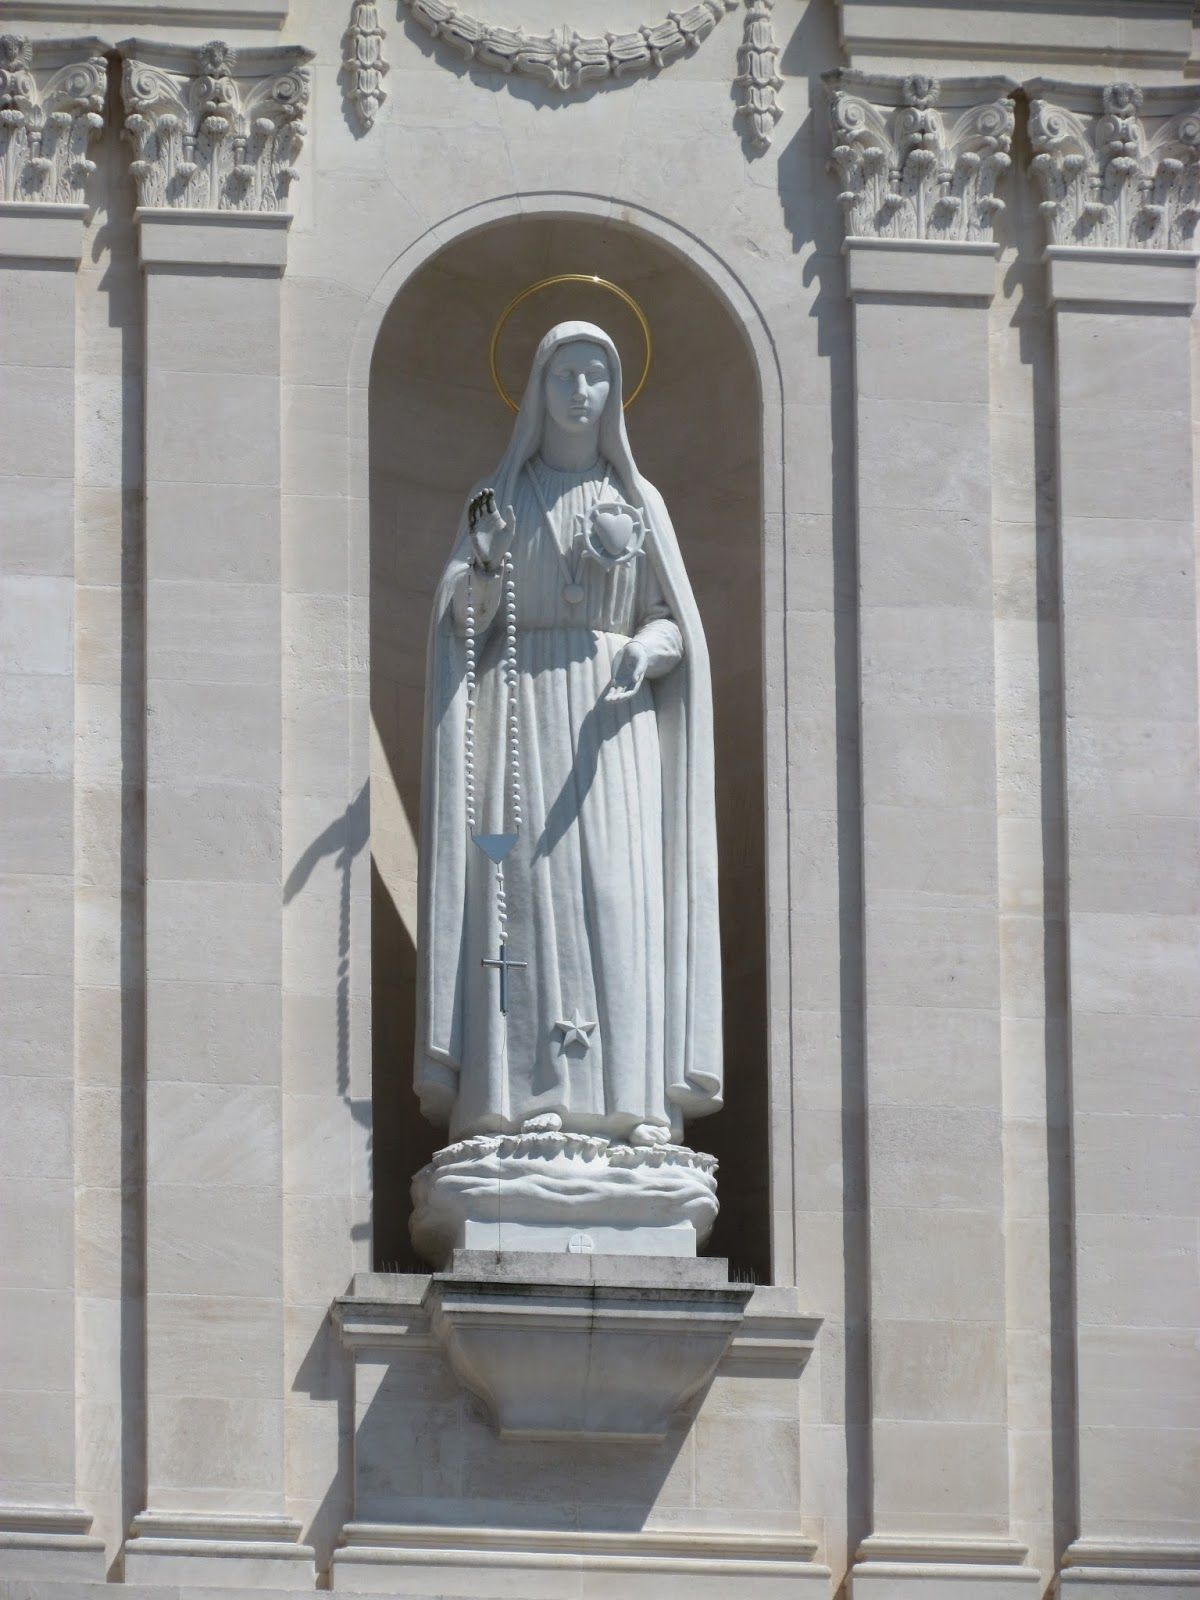 Our Lady of Fatima sculpted by Fr. Thomas Mcglynn O.P.